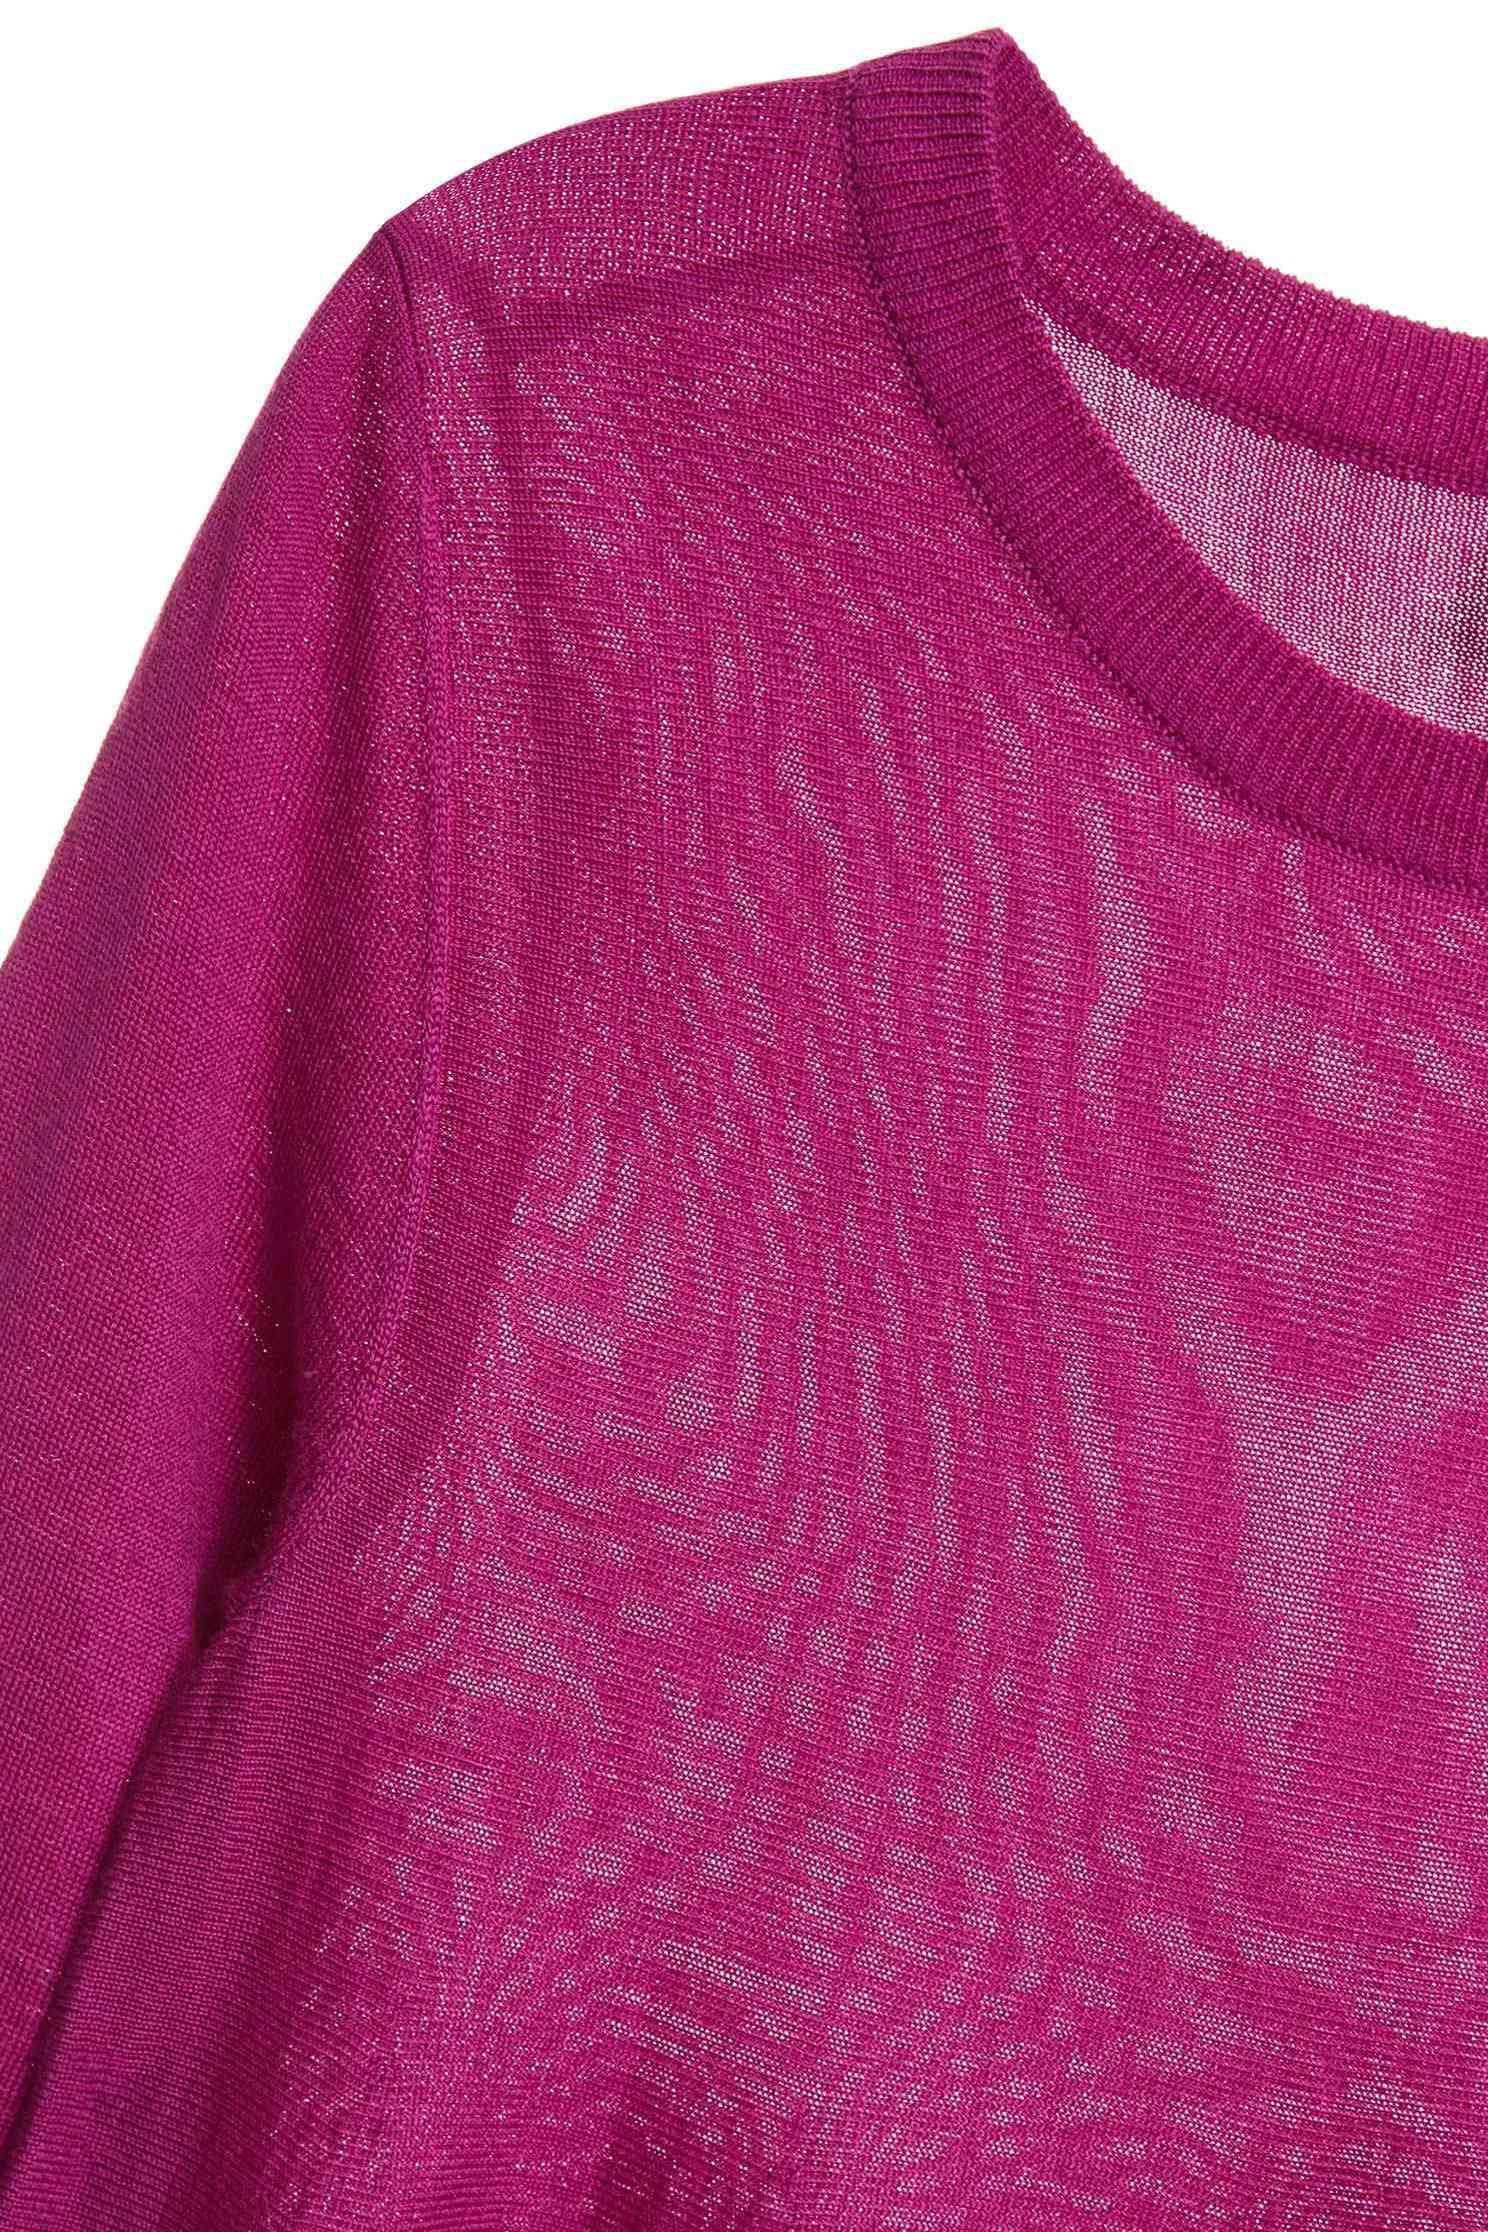 Lotus long-sleeveknit sweater,圓領上衣,Fantasy purple,knitting,Knitted top,Knitted Top,長袖上衣